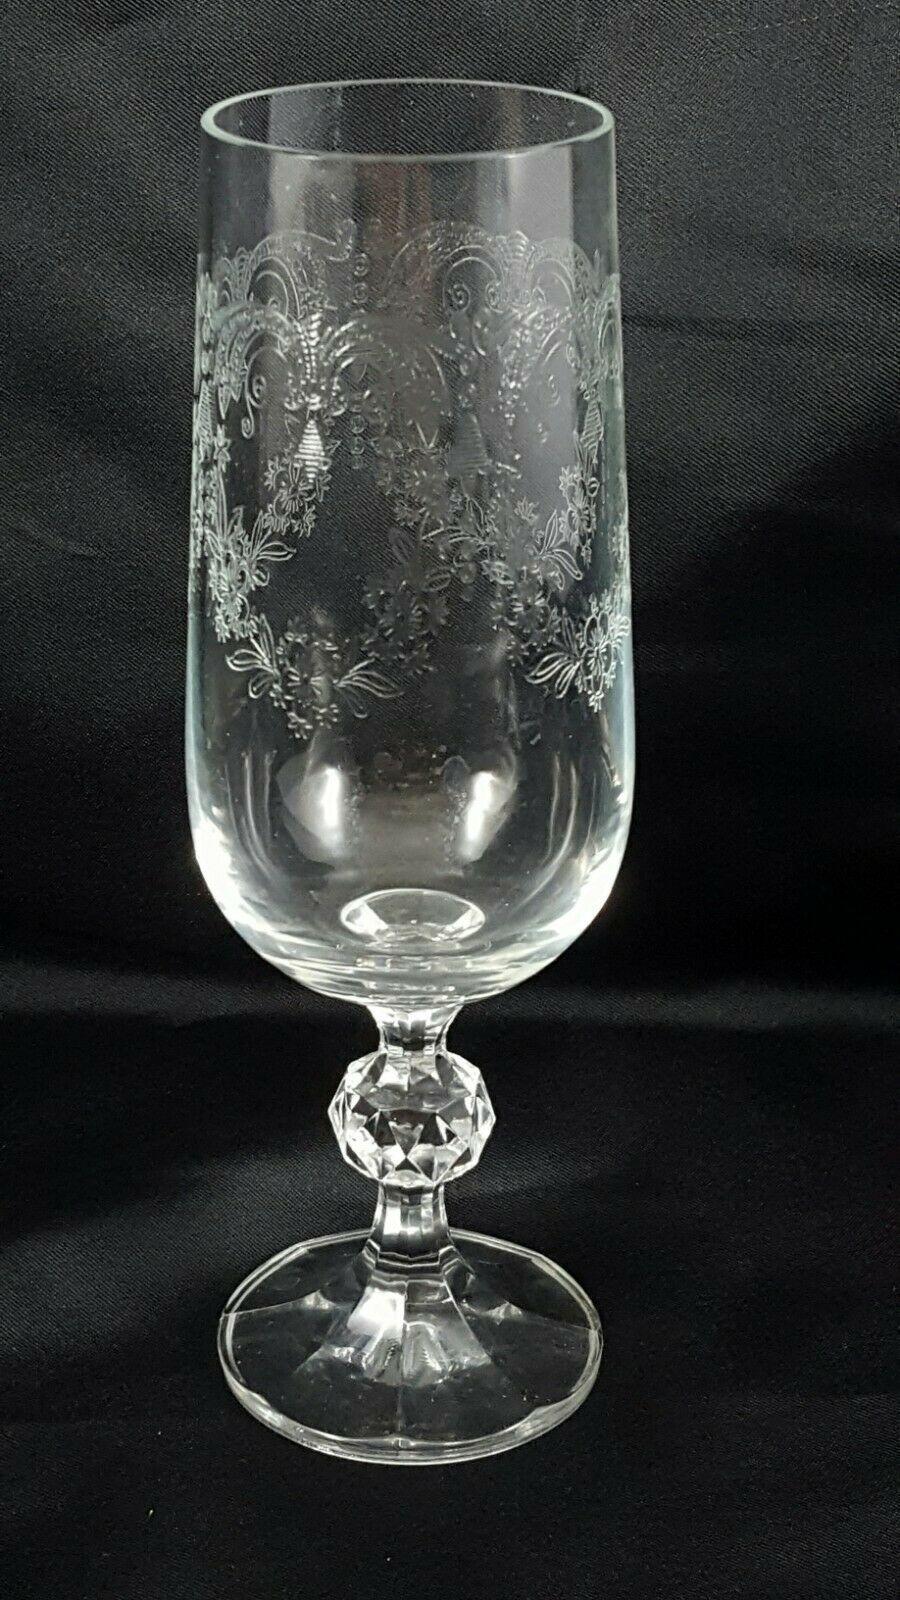 Crystalex Import Assoc Cascade Champagne Flutes Set of 2 Czech Crystal 6 oz image 2